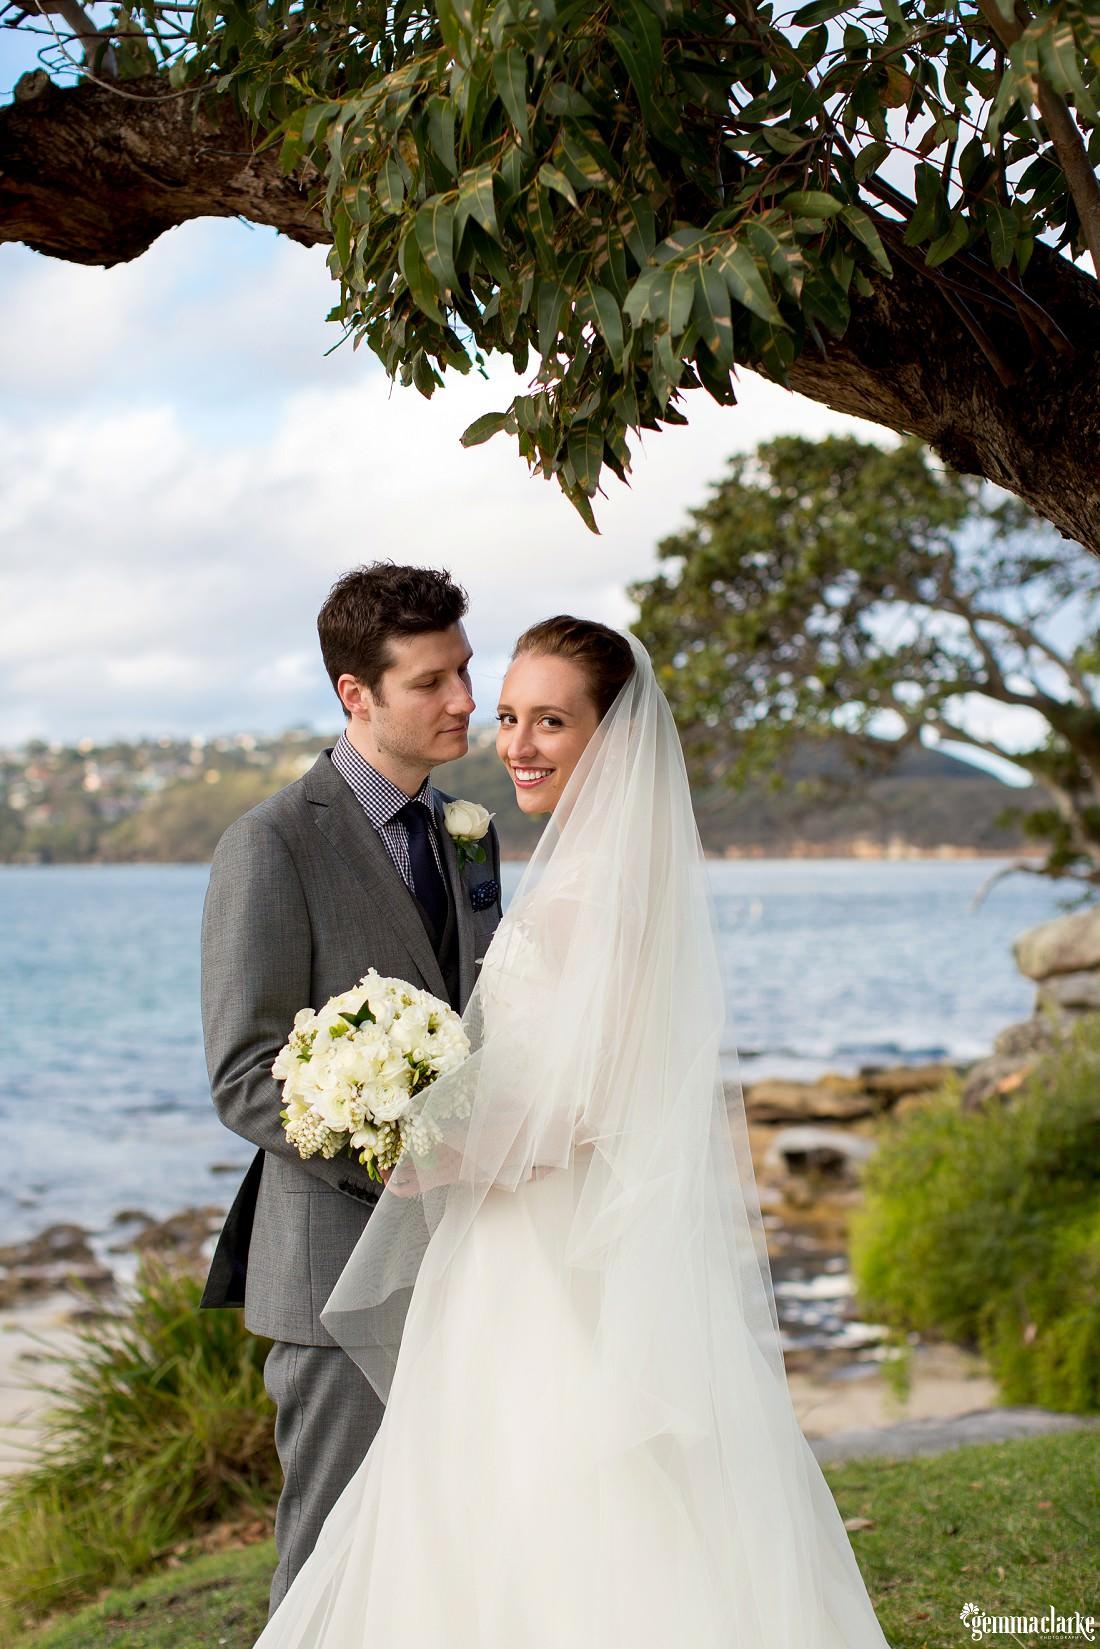 gemma-clarke-photography_kings-school-wedding_balmoral-beach-reception_bathers-pavilion-wedding_luisa-and-nick_0057